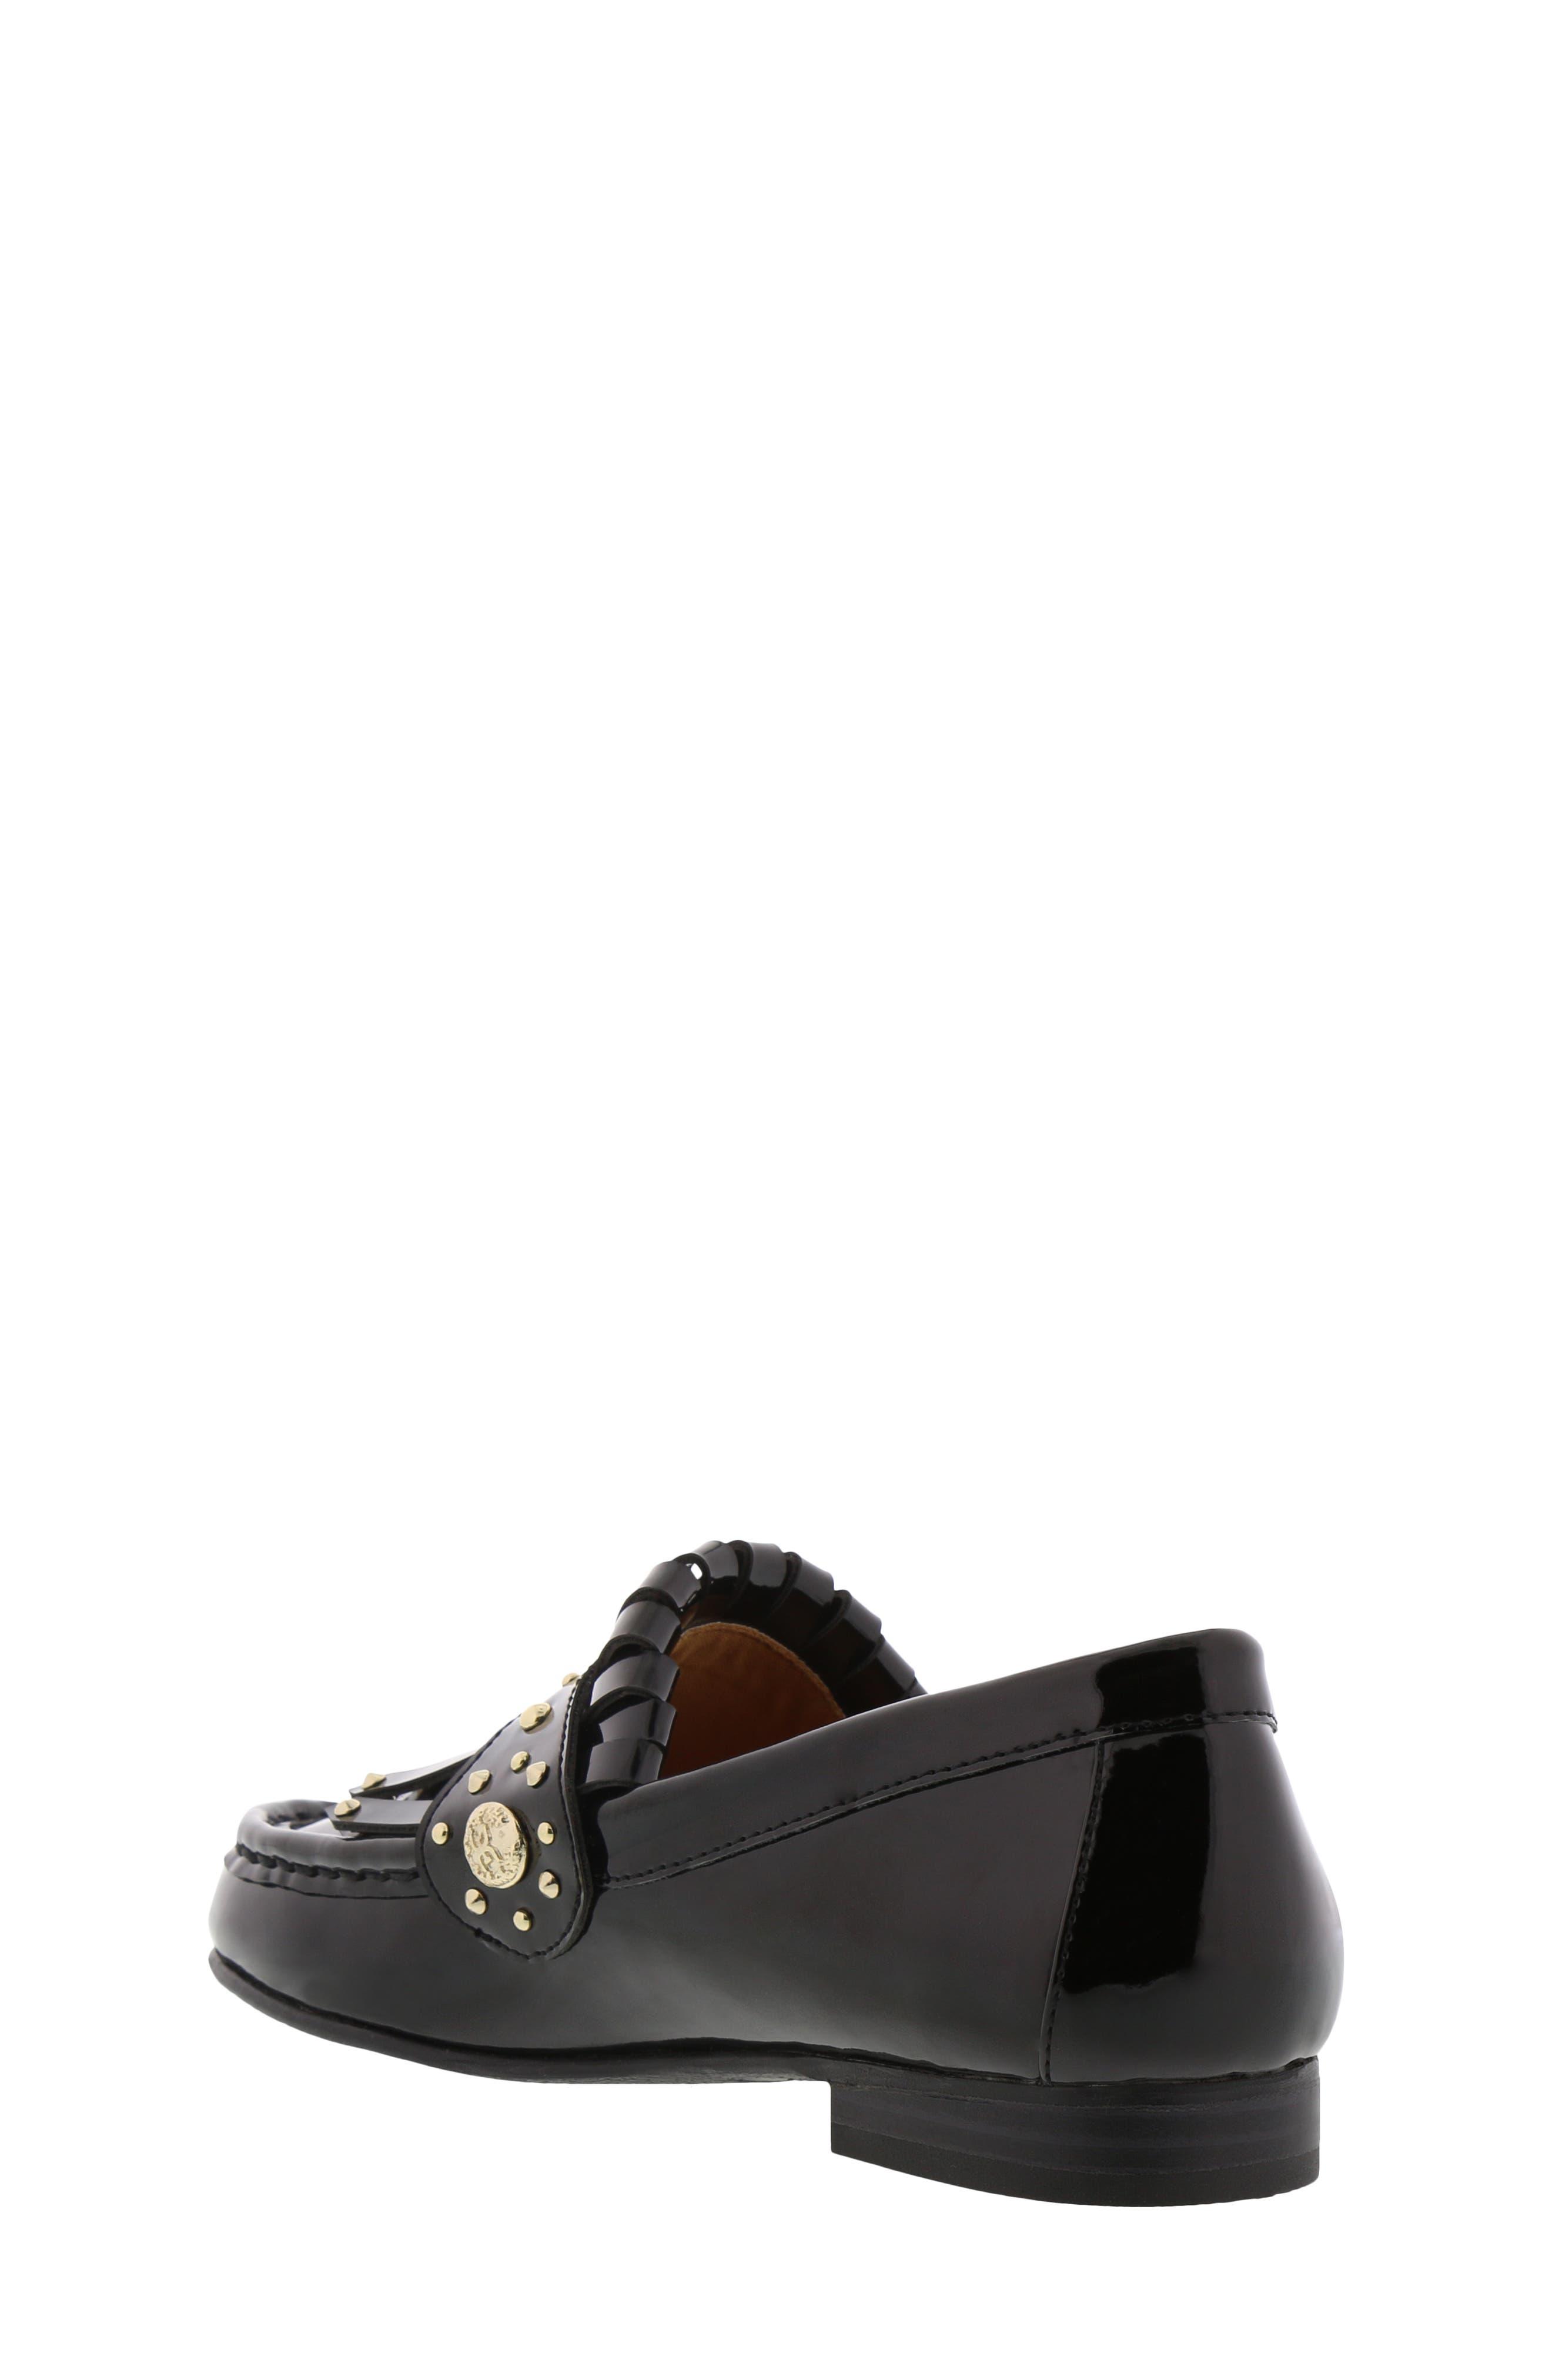 Gabriella Serona Studded Kiltie Loafer,                             Alternate thumbnail 2, color,                             Black